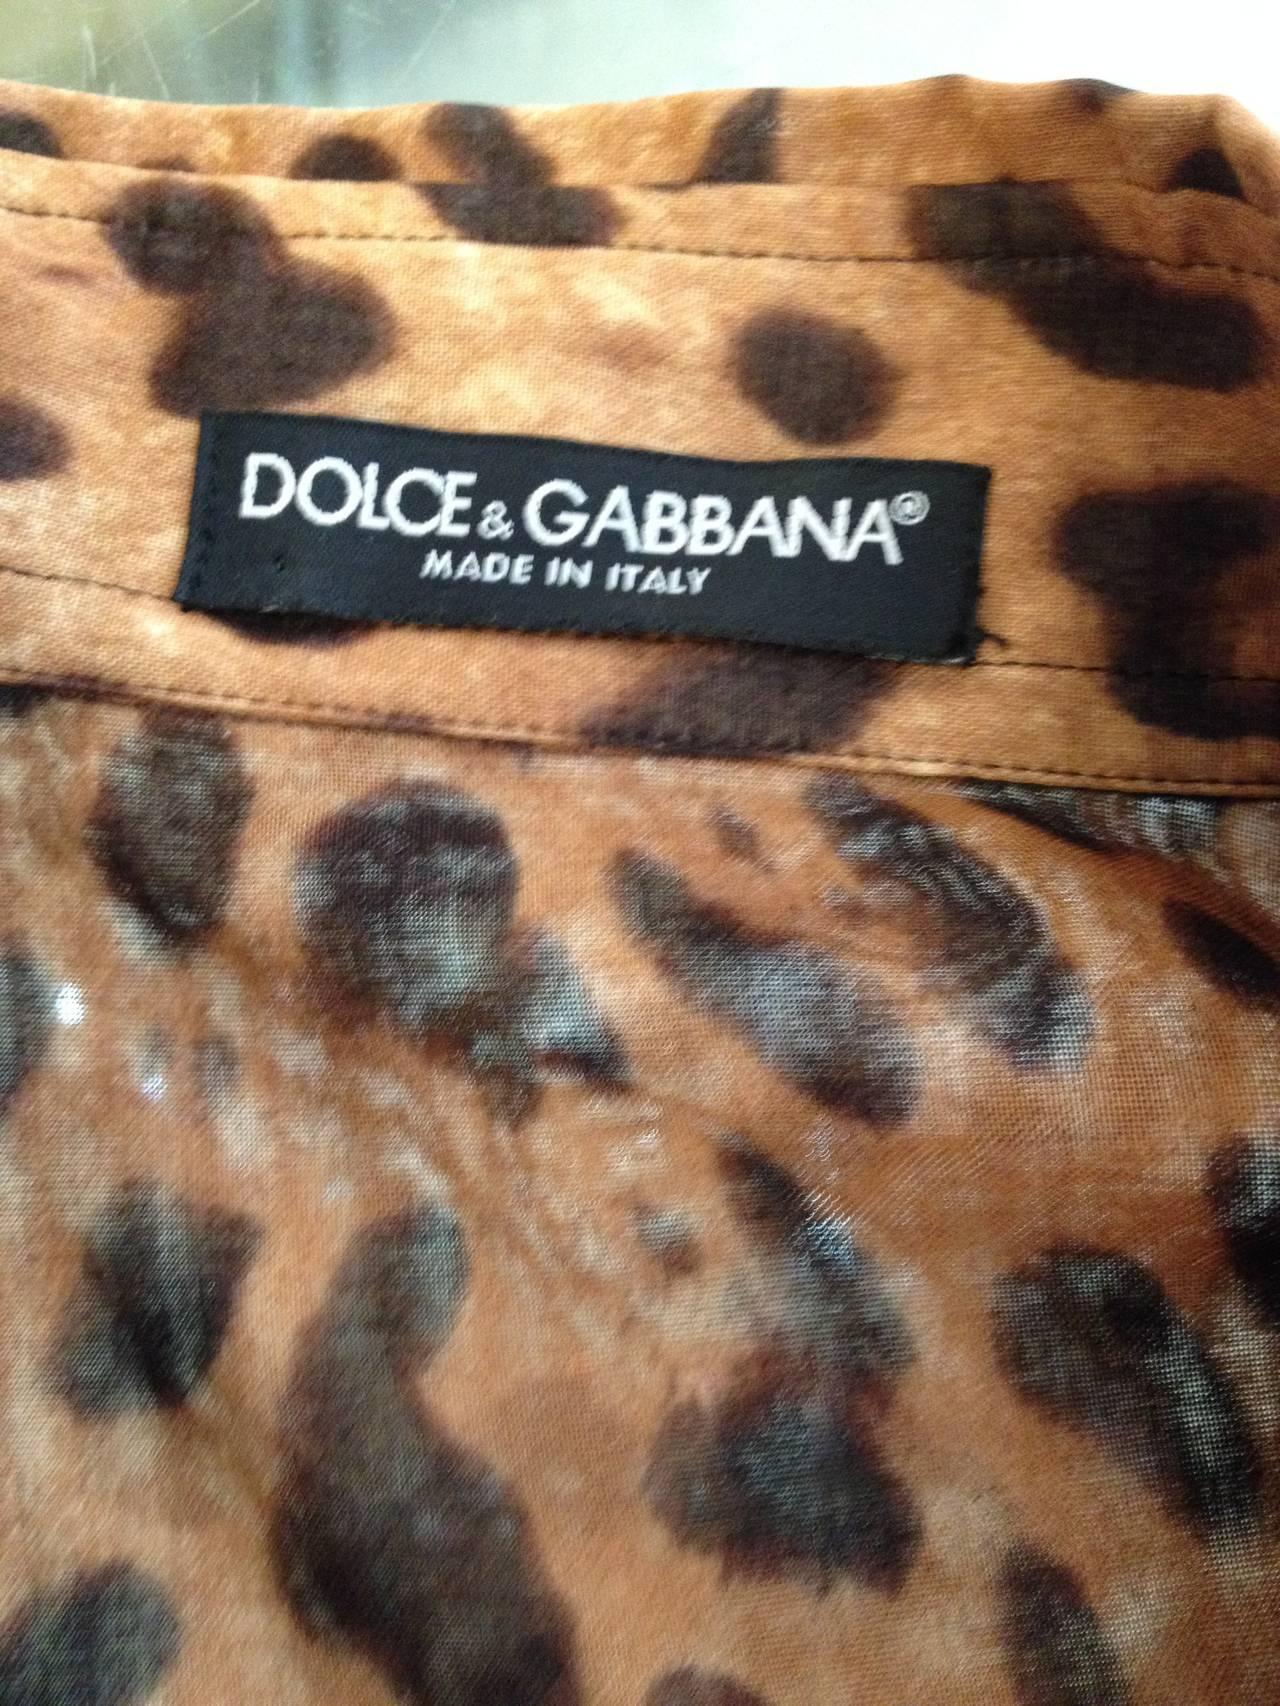 Dolce & Gabbana Tan and Brown Leopard Print Shirt 5